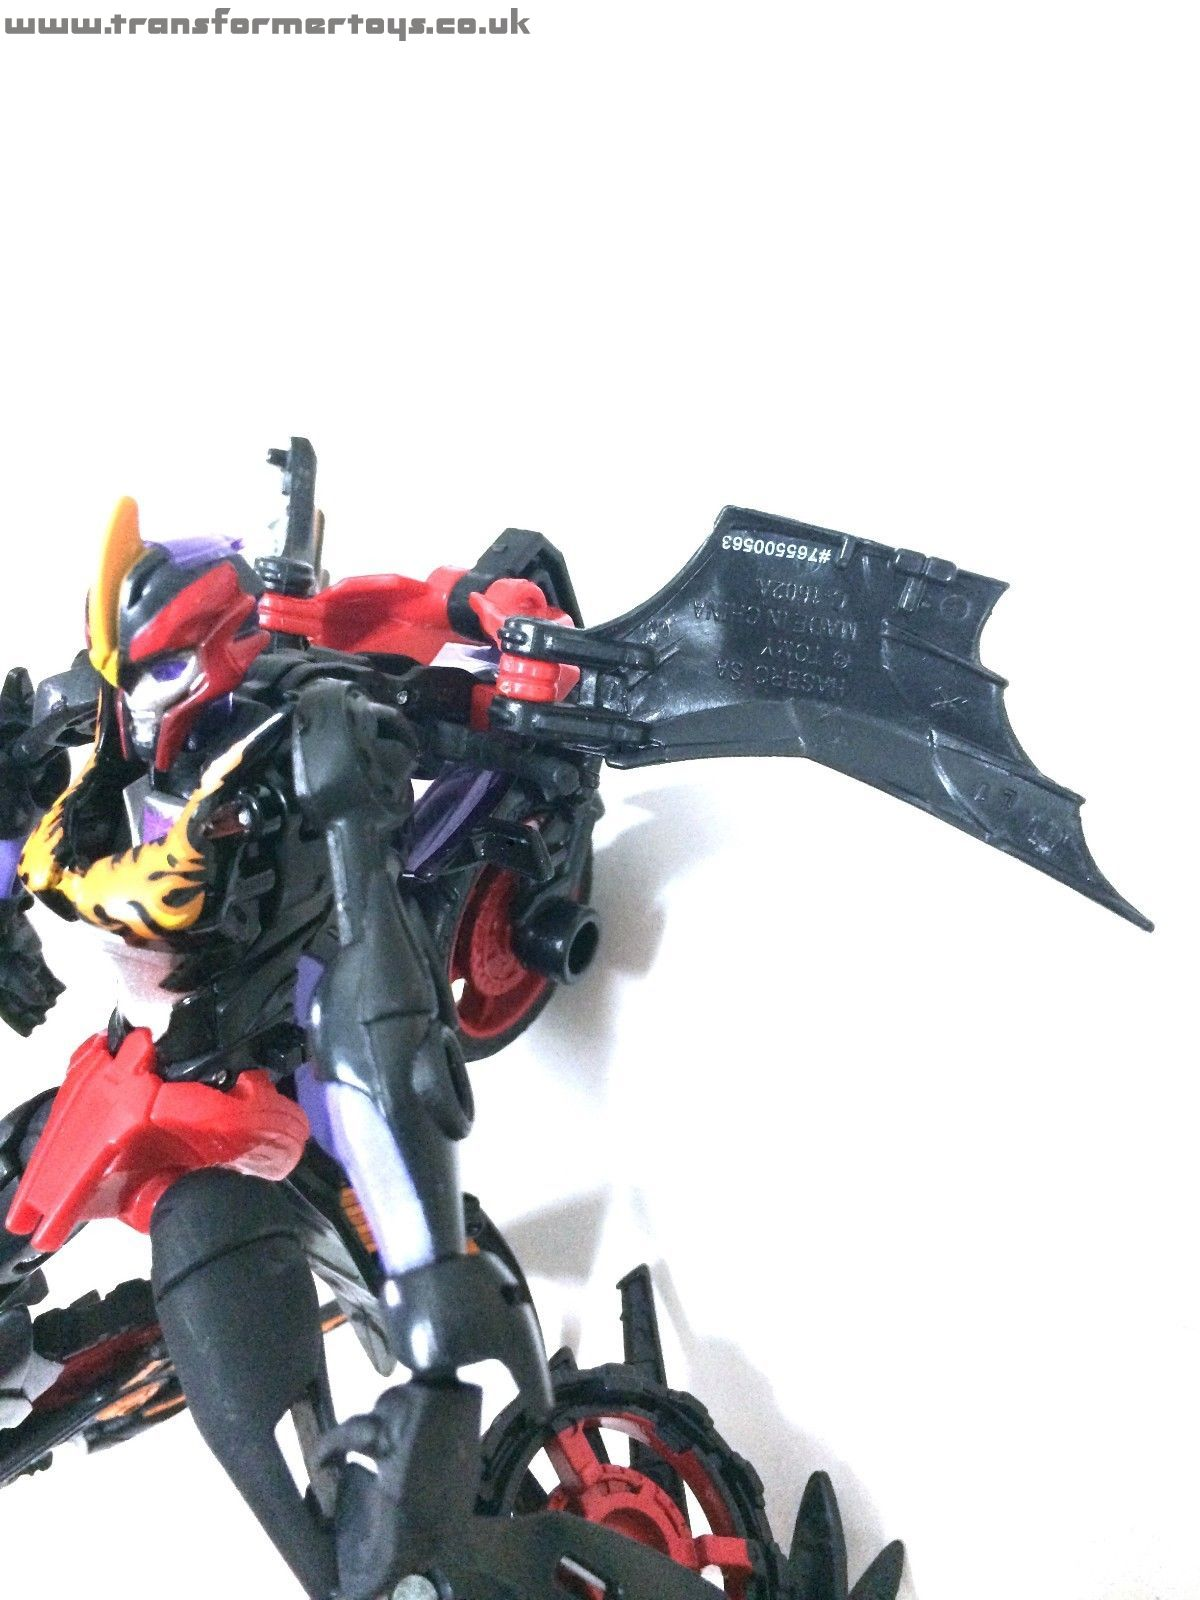 Transformers Botcon Toys 28